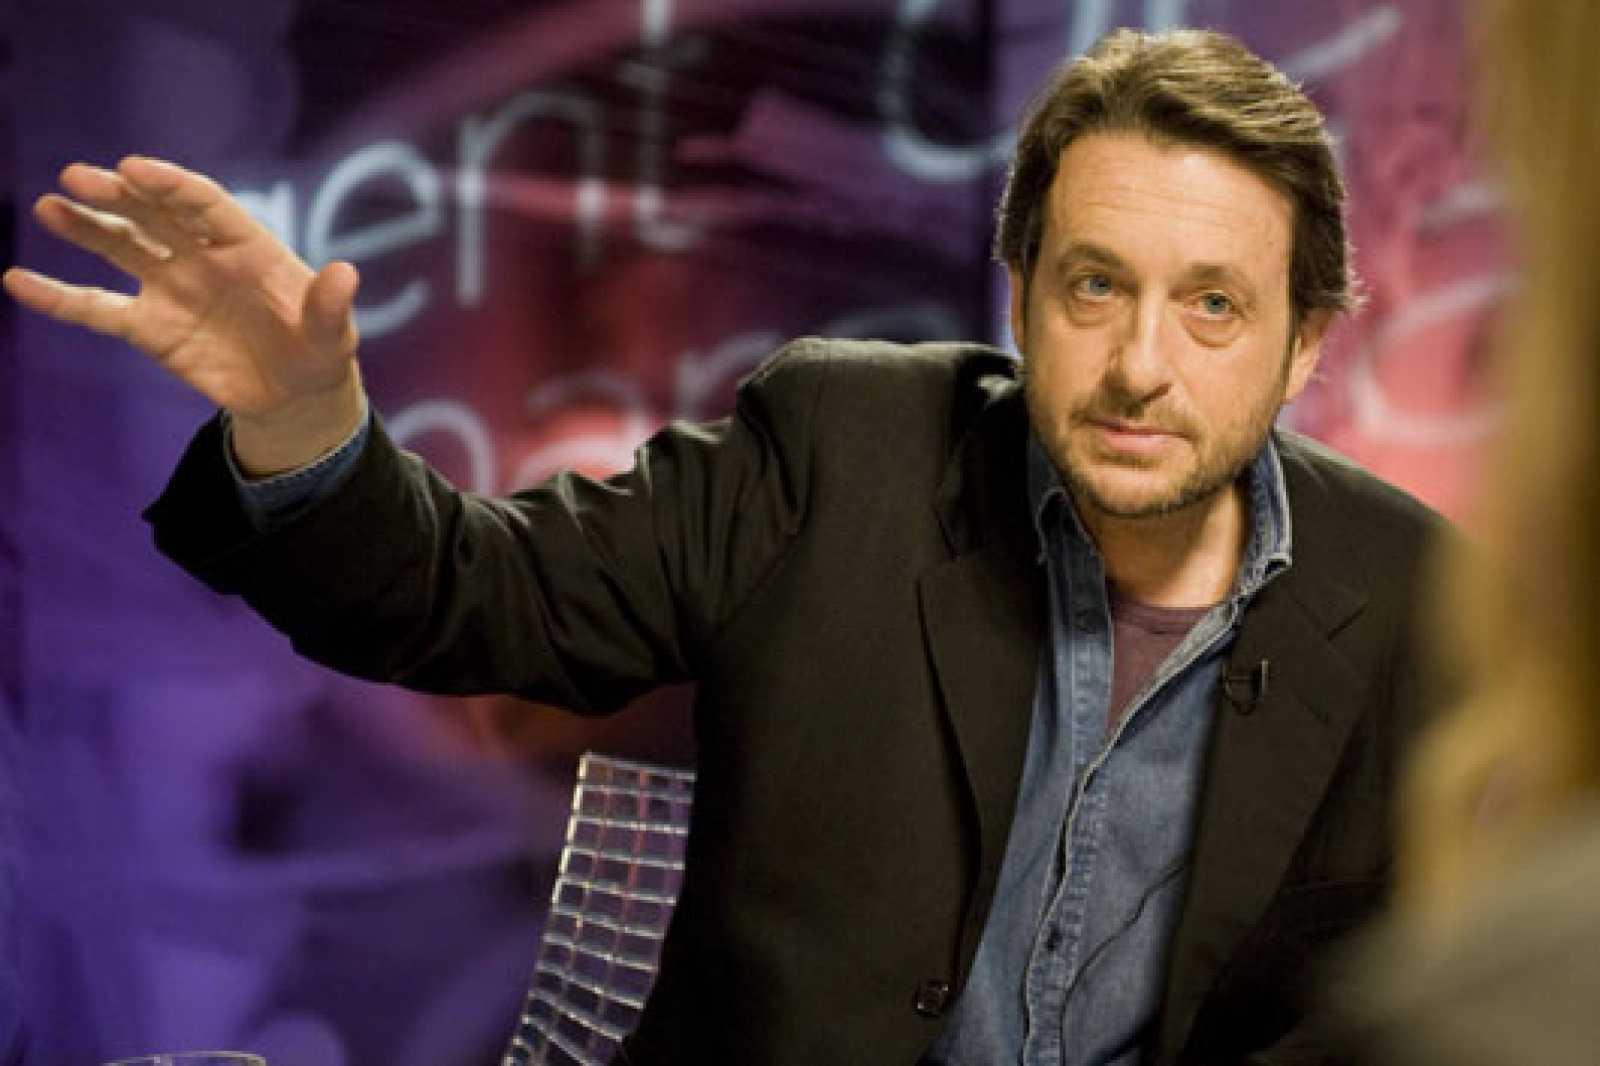 Gent de paraula (17/03/11) : Ramon Madaula